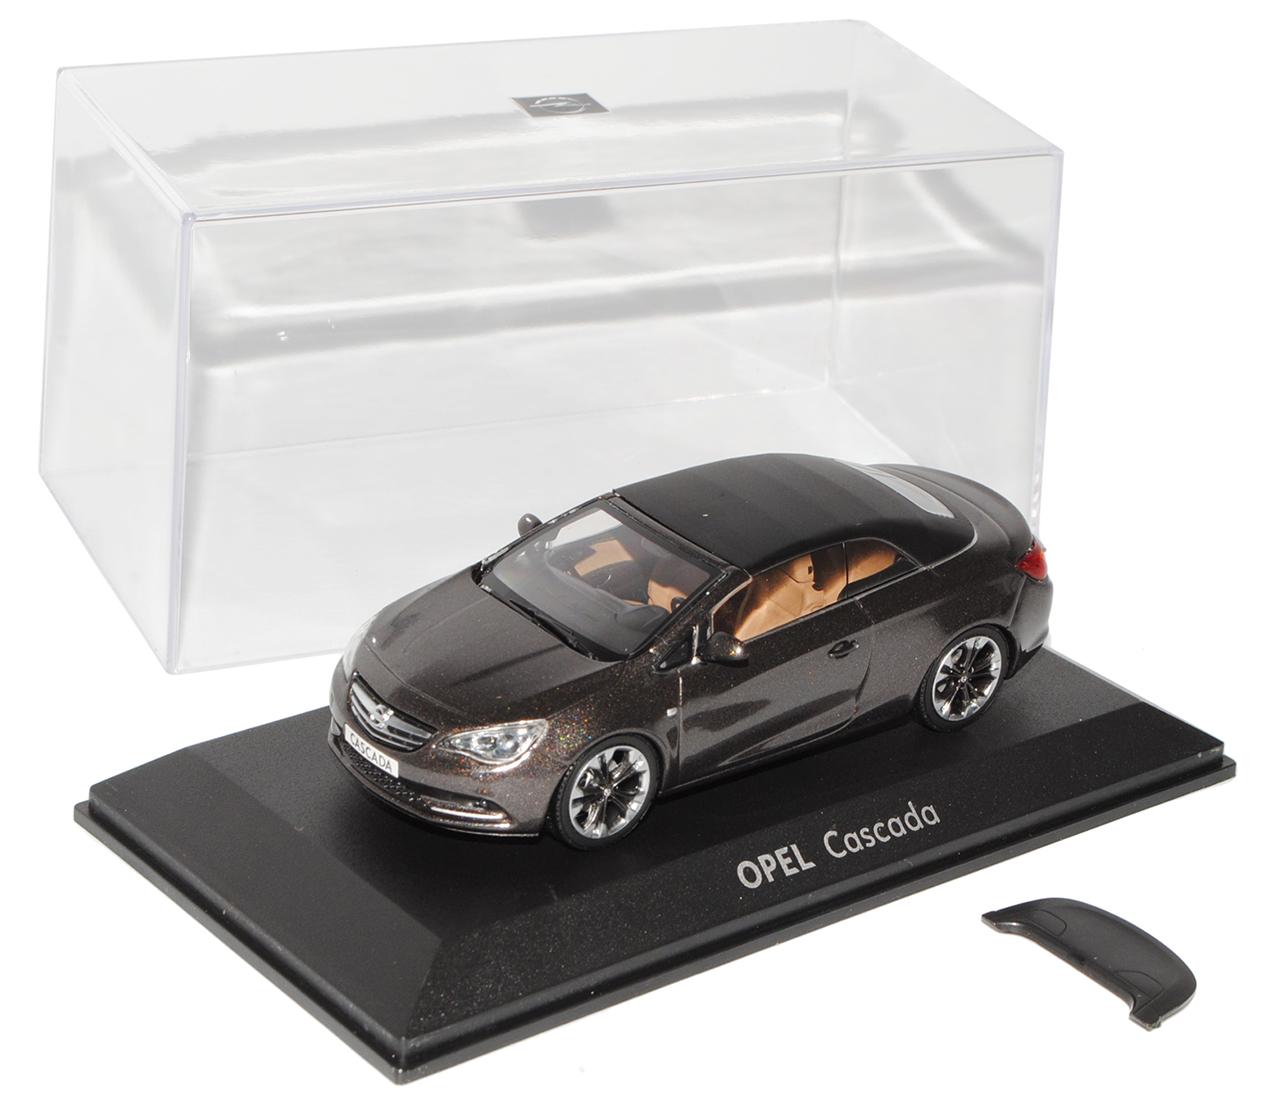 Opel cascada asteroide gris convertible abierta con Soft top 1//43 Minichamps modelo au...